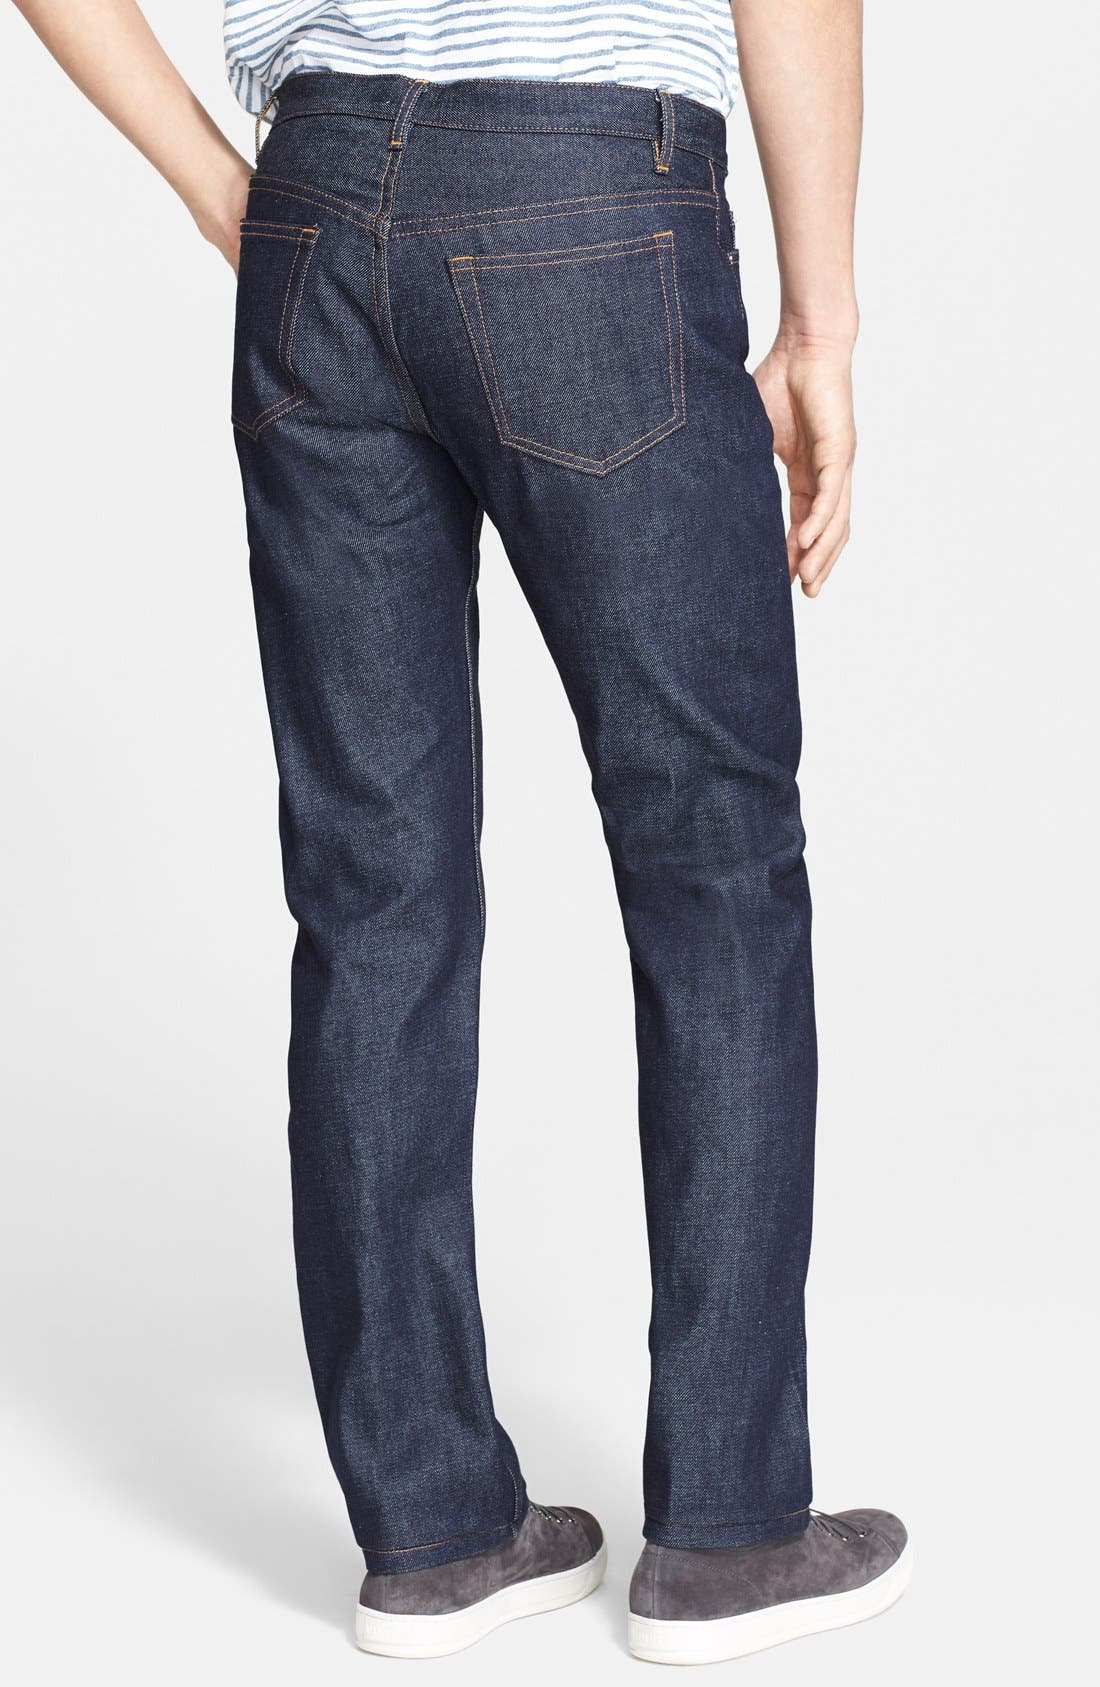 New Standard Slim Straight Leg Raw Selvedge Jeans,                             Alternate thumbnail 4, color,                             INDIGO WASH